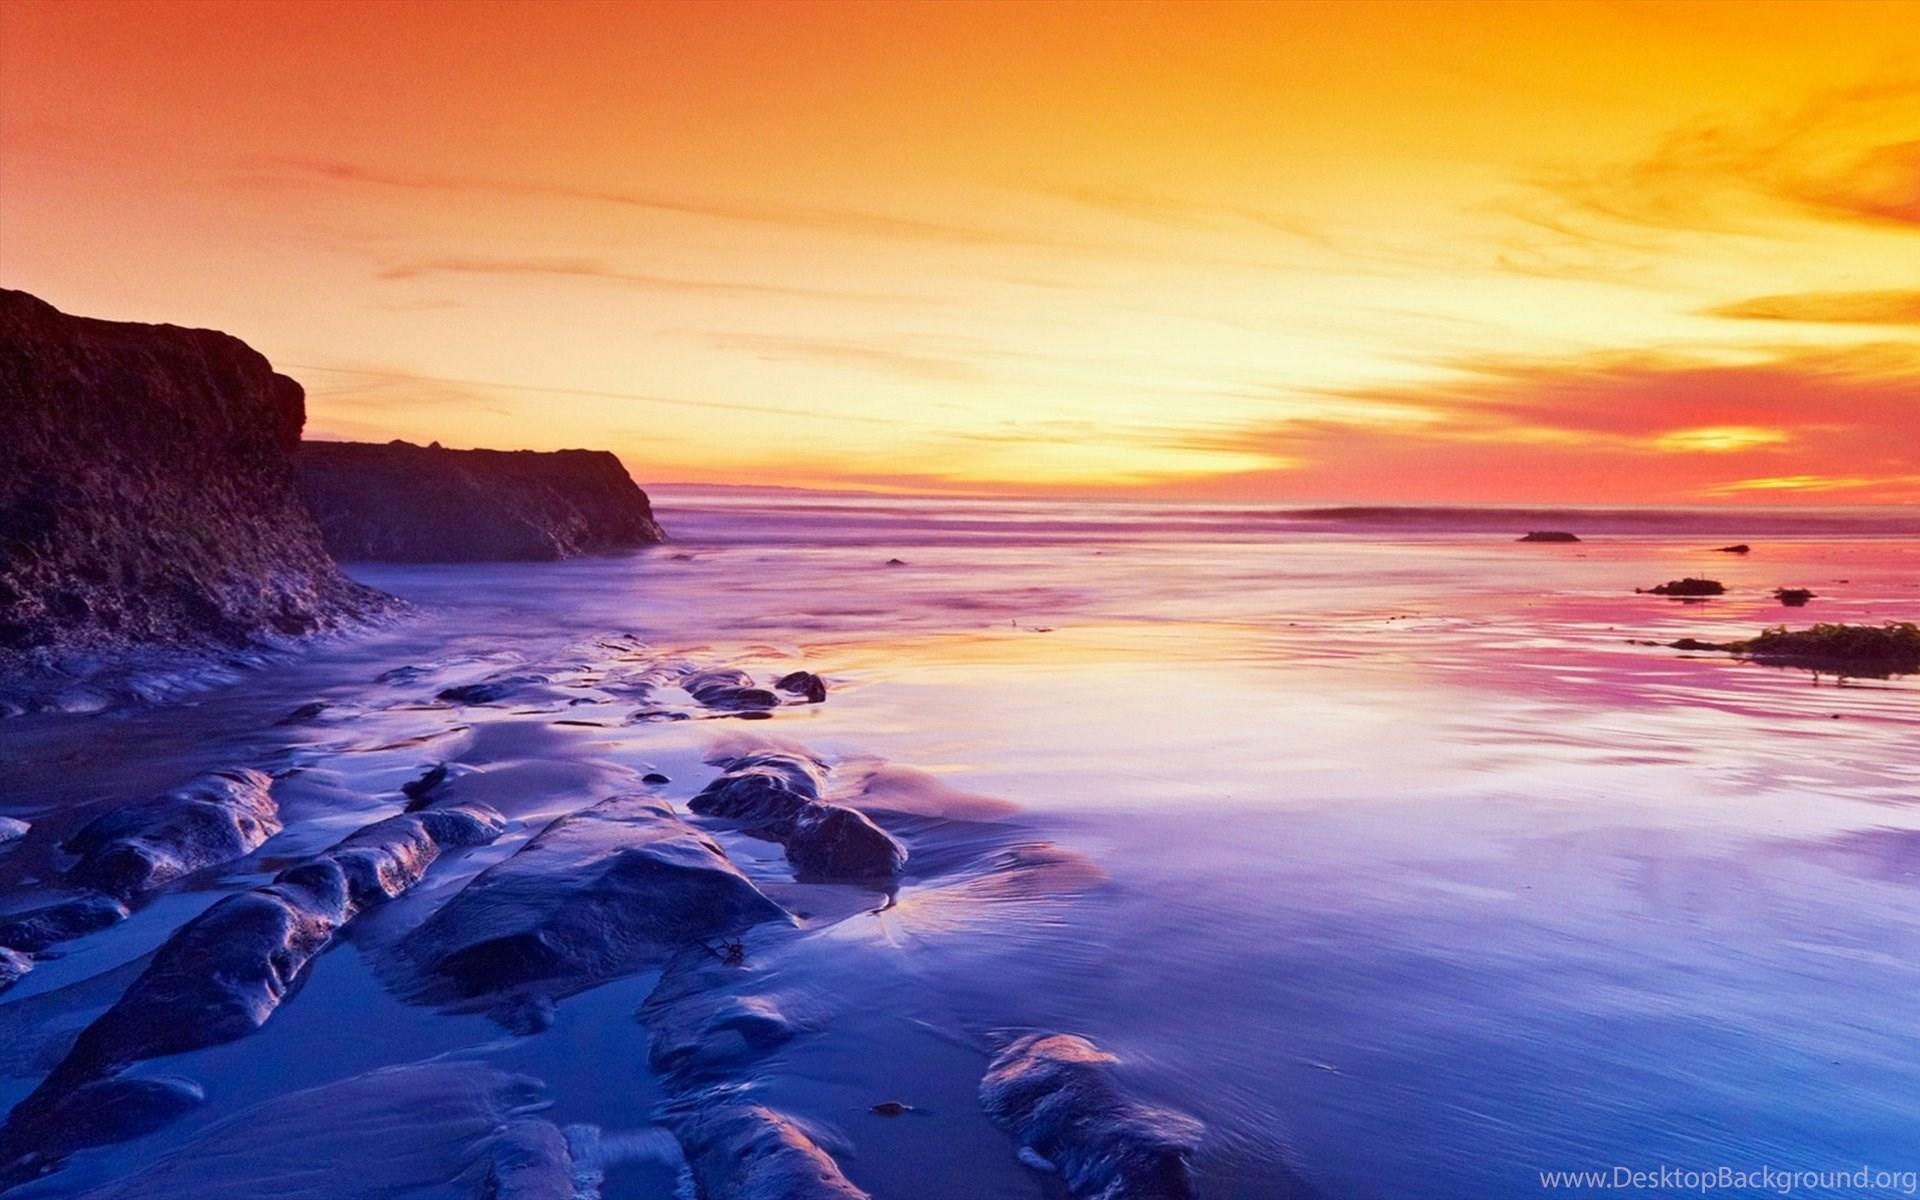 Sunset Wallpapers, Photography, Backgrounds Windows Desktop